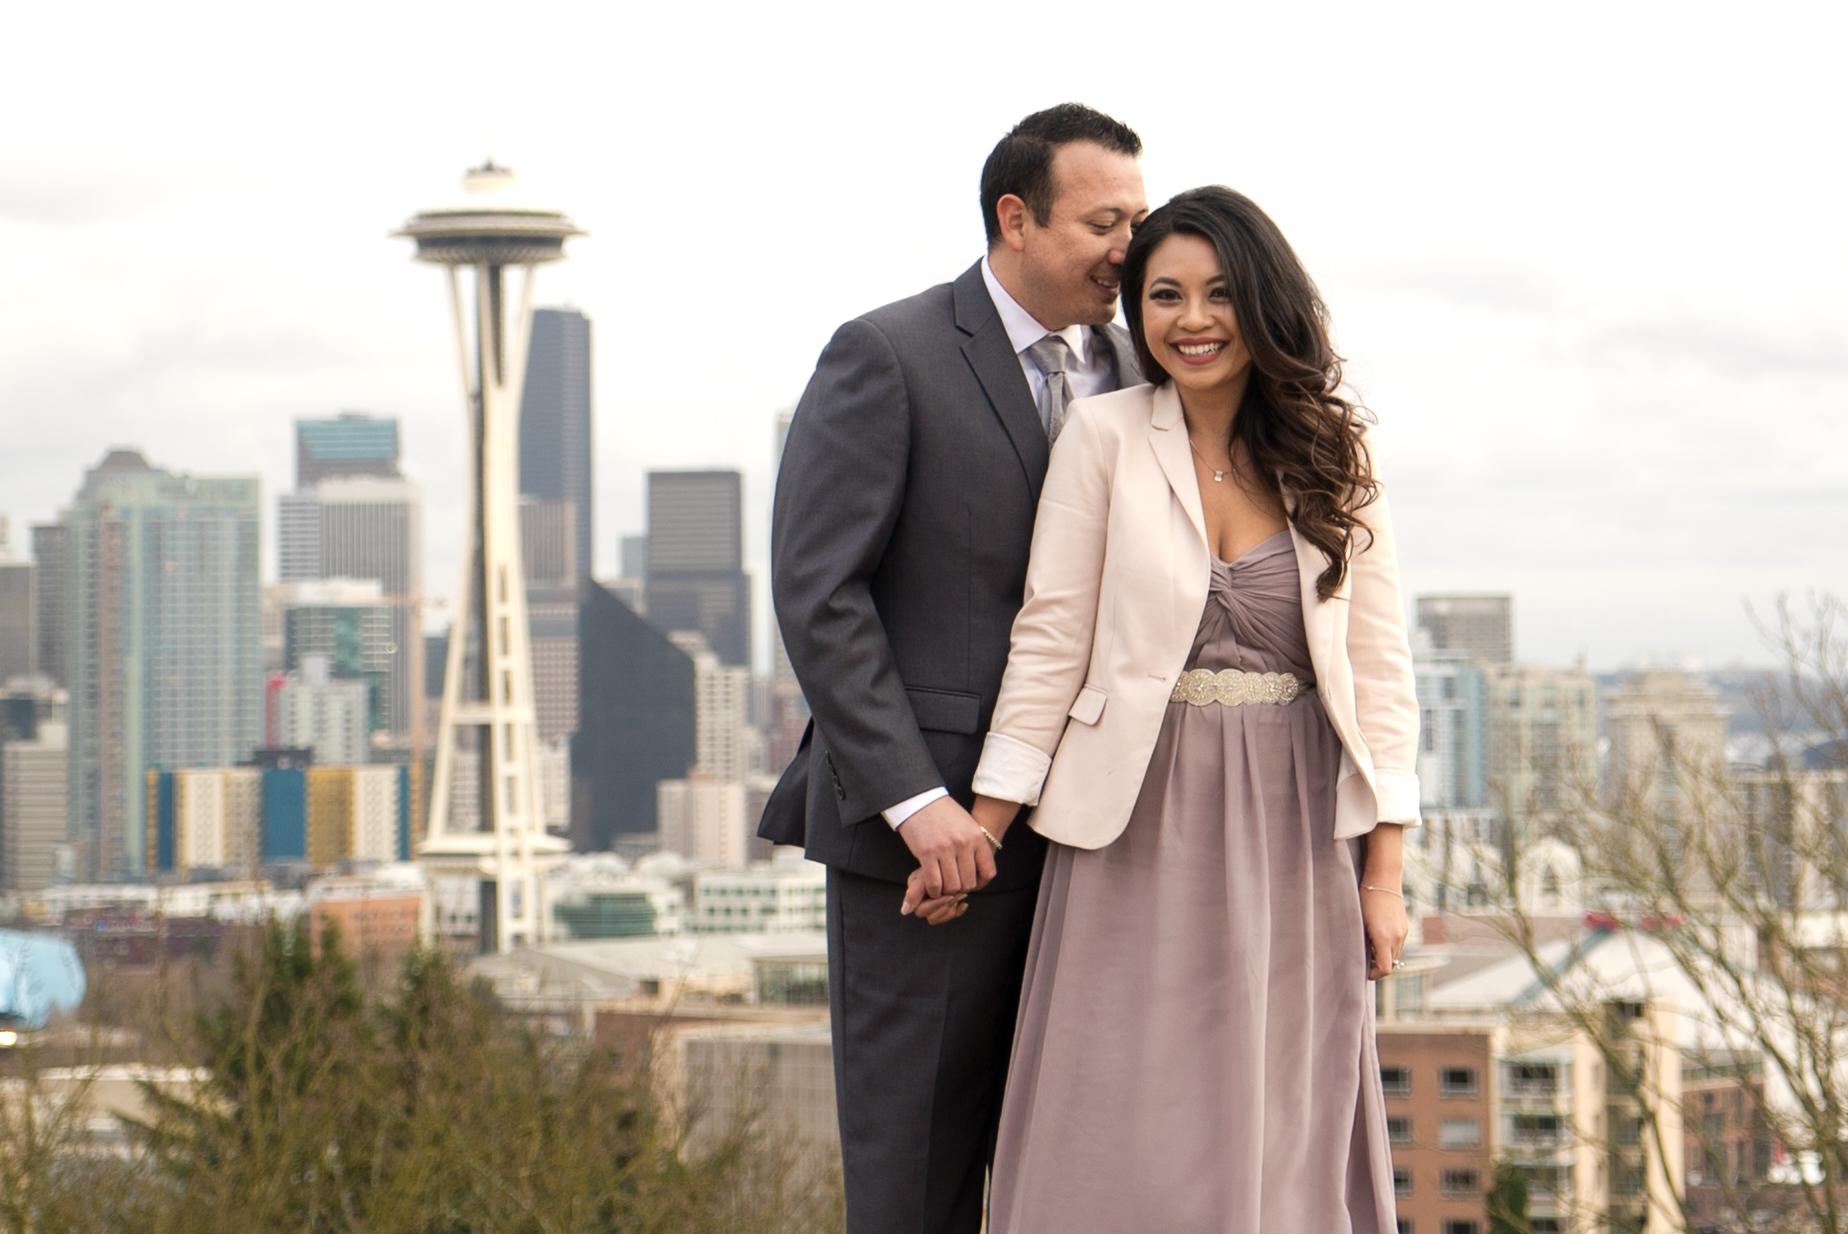 Seattle Engagement Photo Session45.jpg